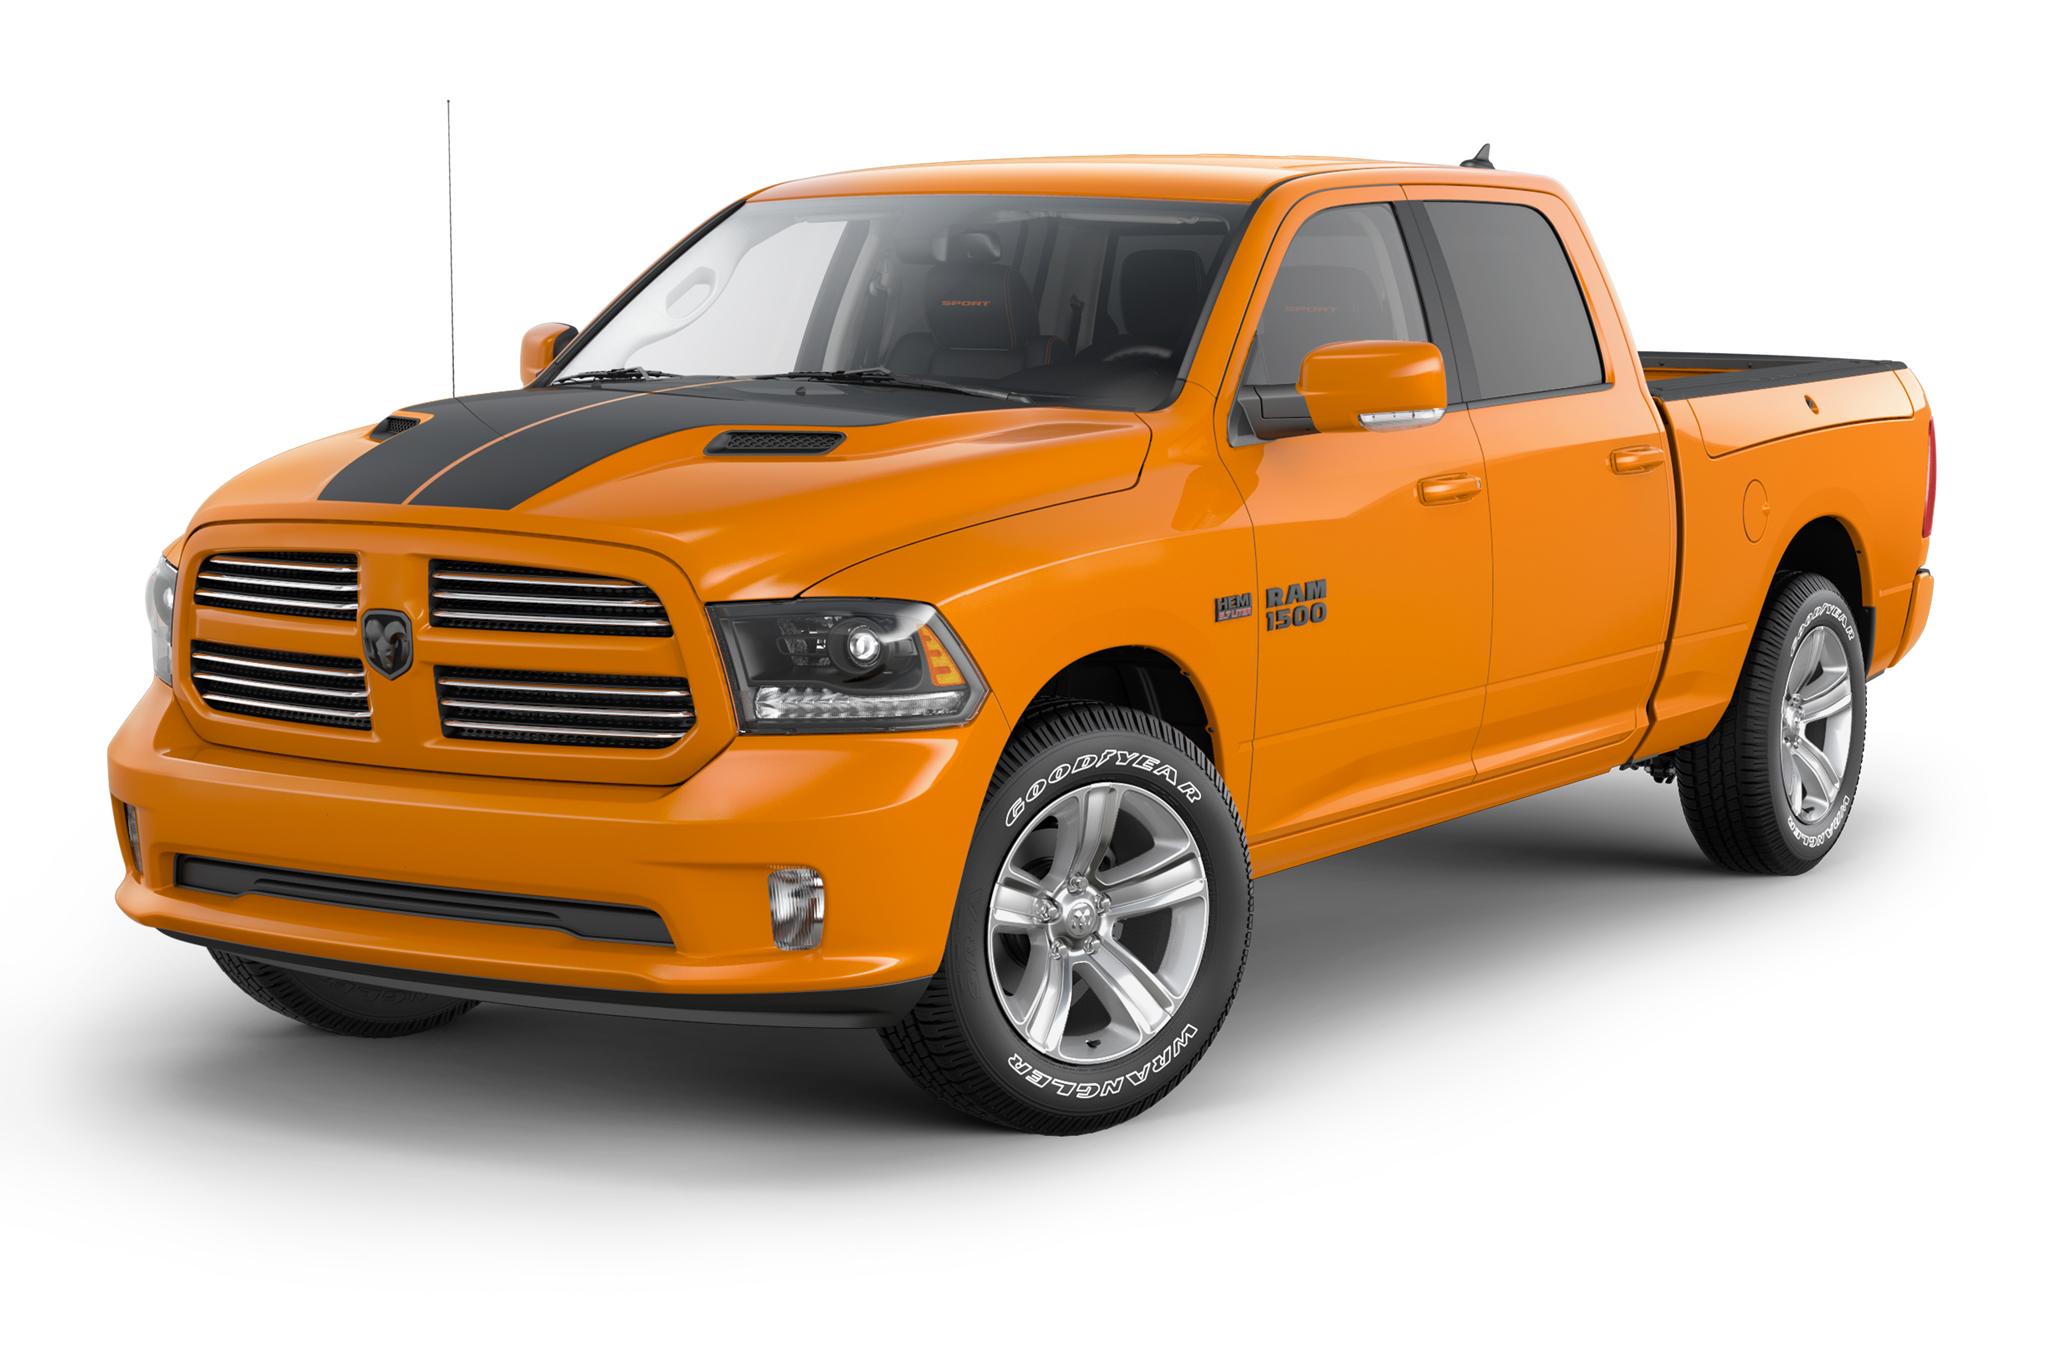 2015 ram 1500 ignition orange sport black sport editions limited to 1 000 units each. Black Bedroom Furniture Sets. Home Design Ideas